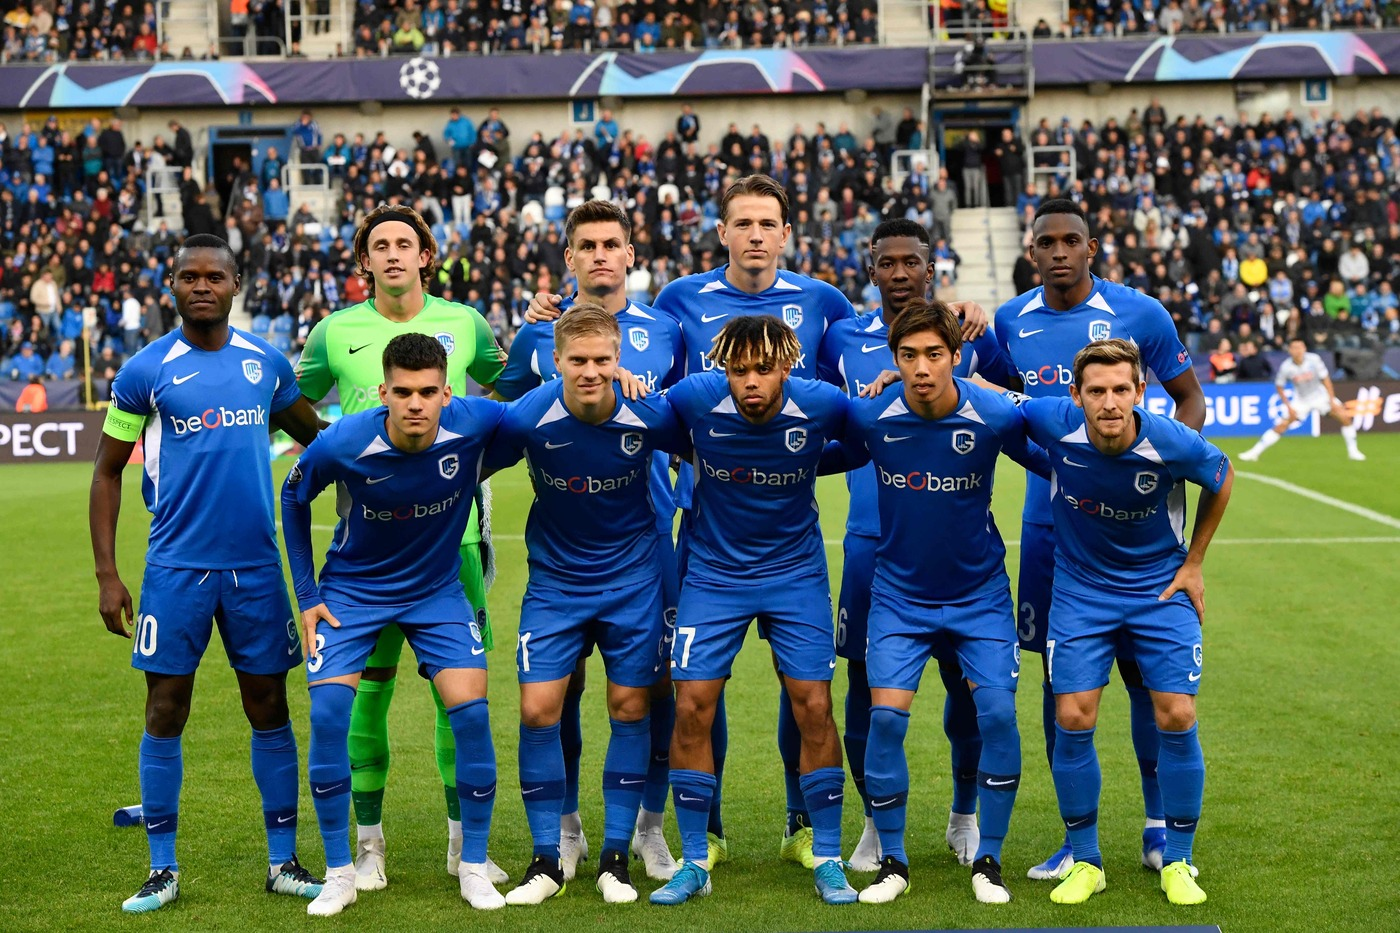 pronostici-belgio-jupiler-league-giornata-5-calcio-quote